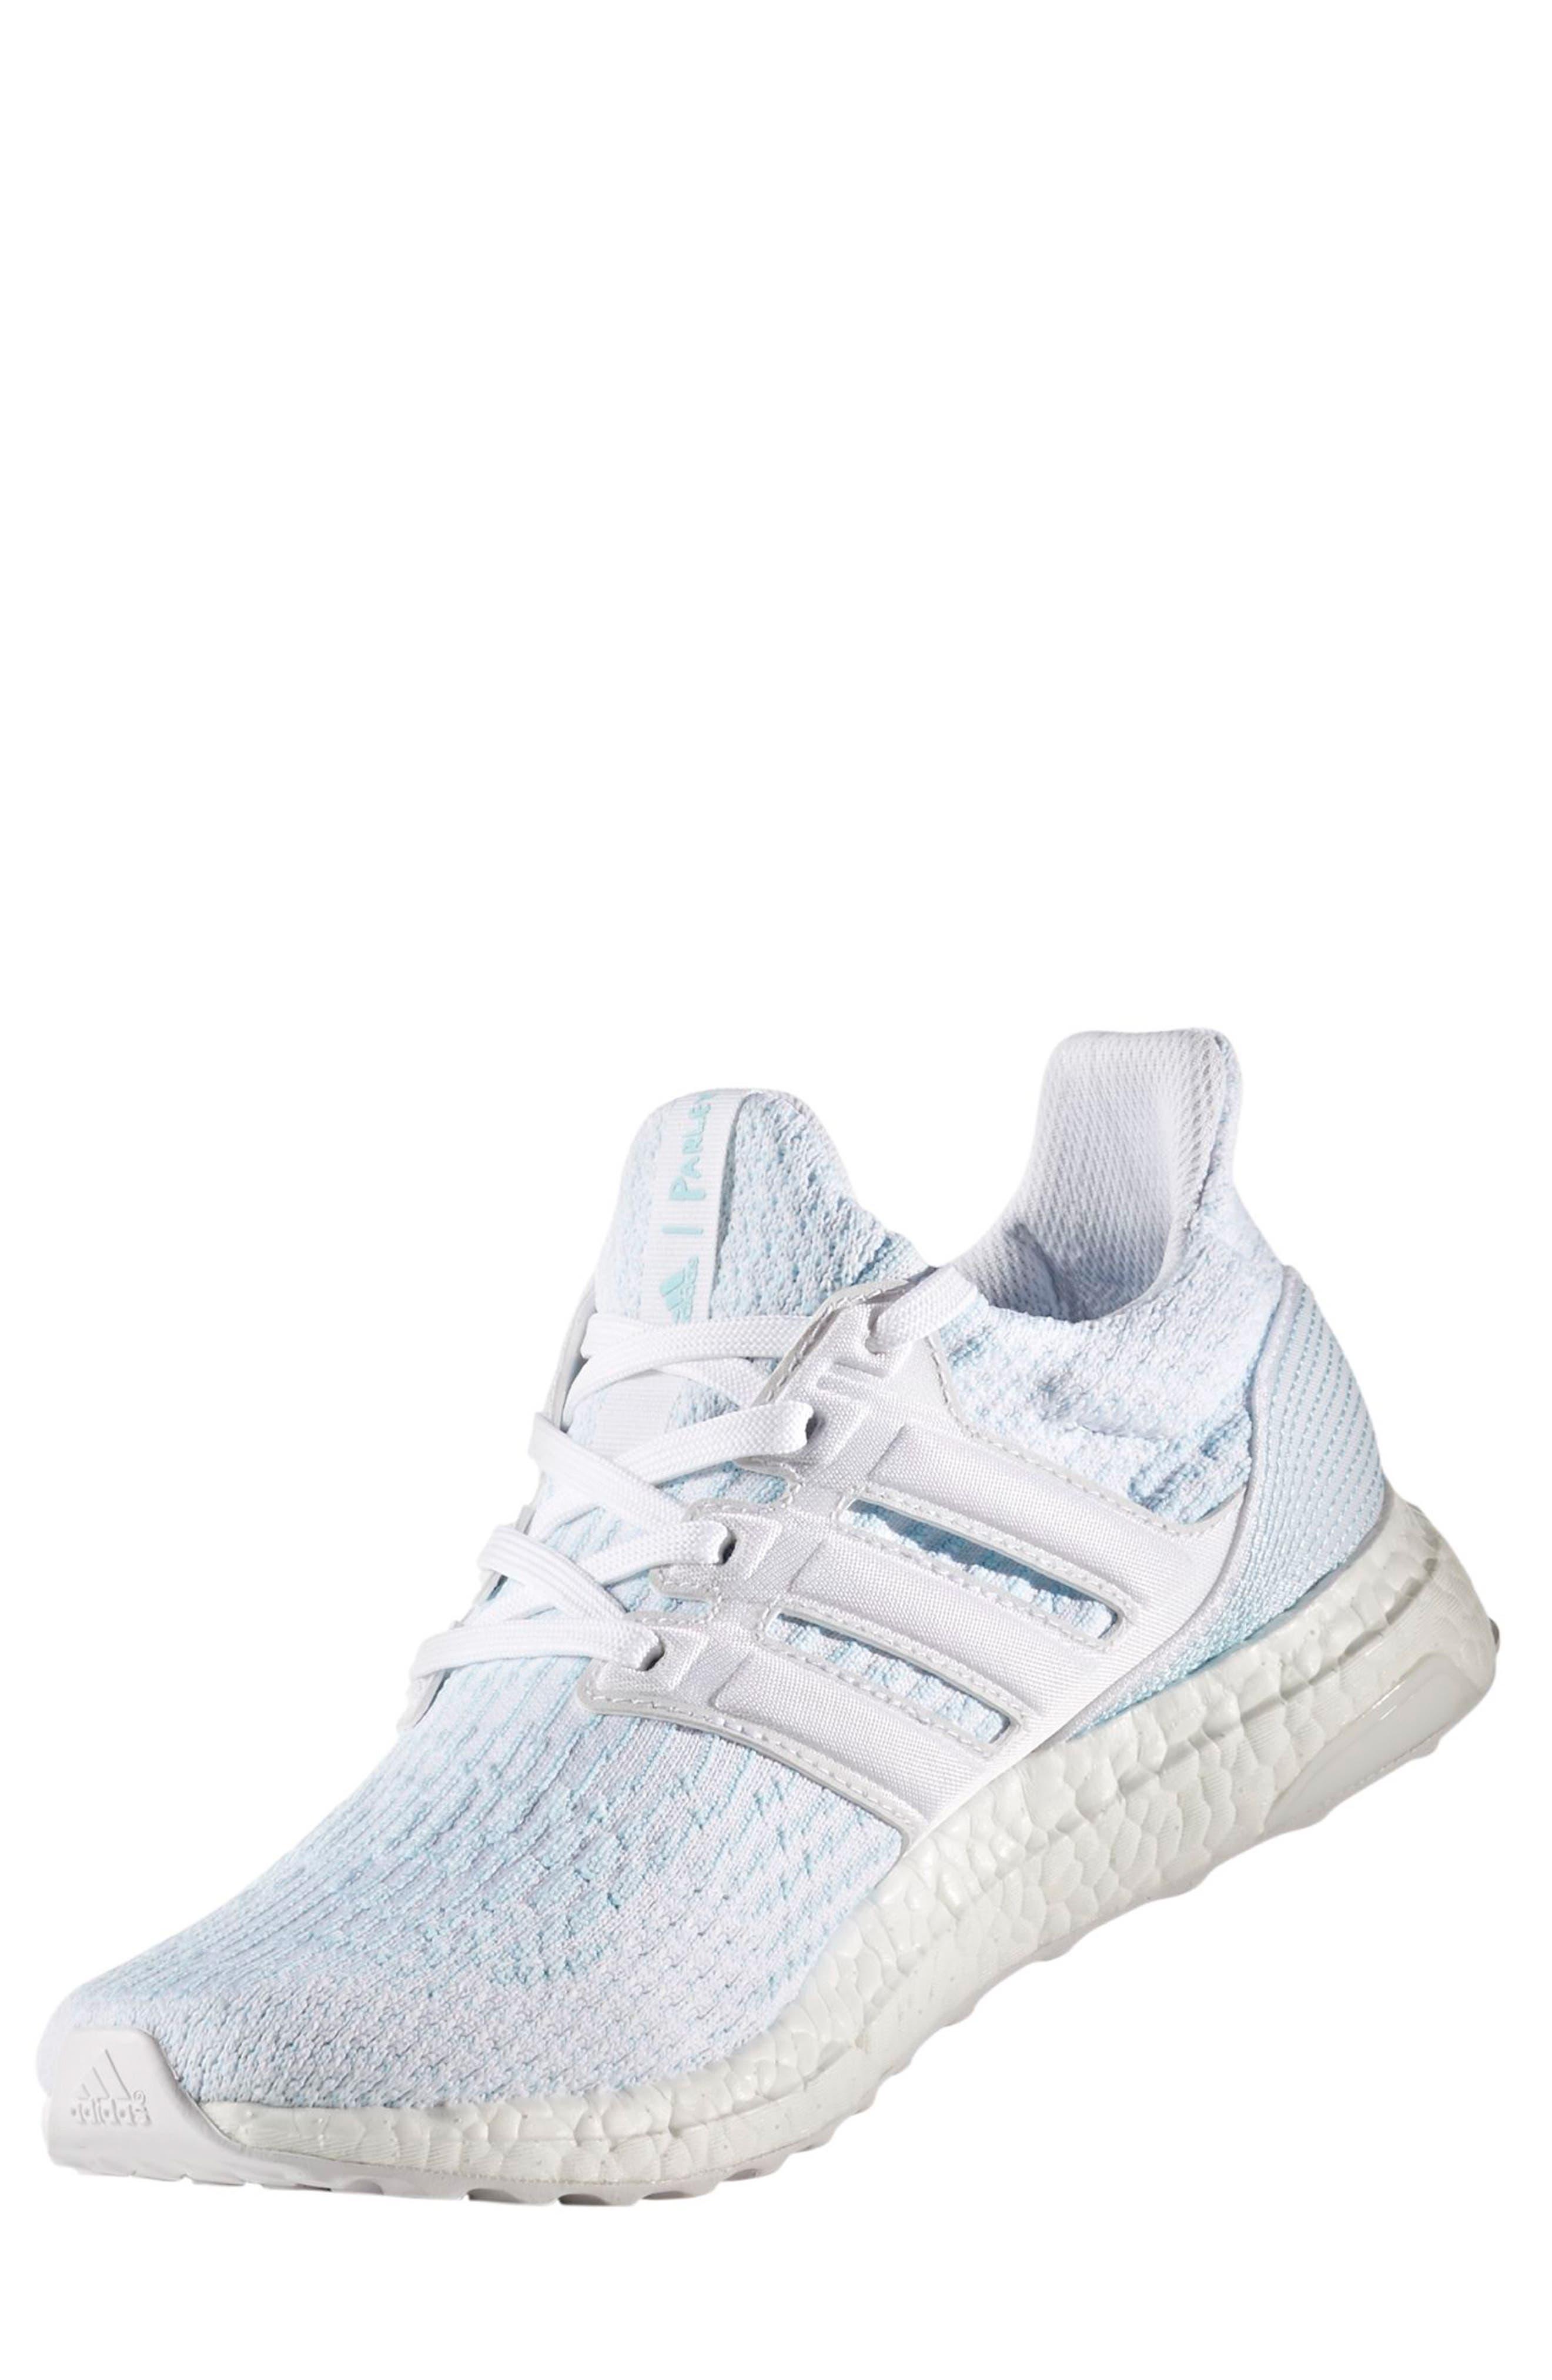 reputable site 52c38 e4ea4 ... low price france adidas parley ultraboost sneaker men 37dfa 1e2c9 827f4  a6d0b